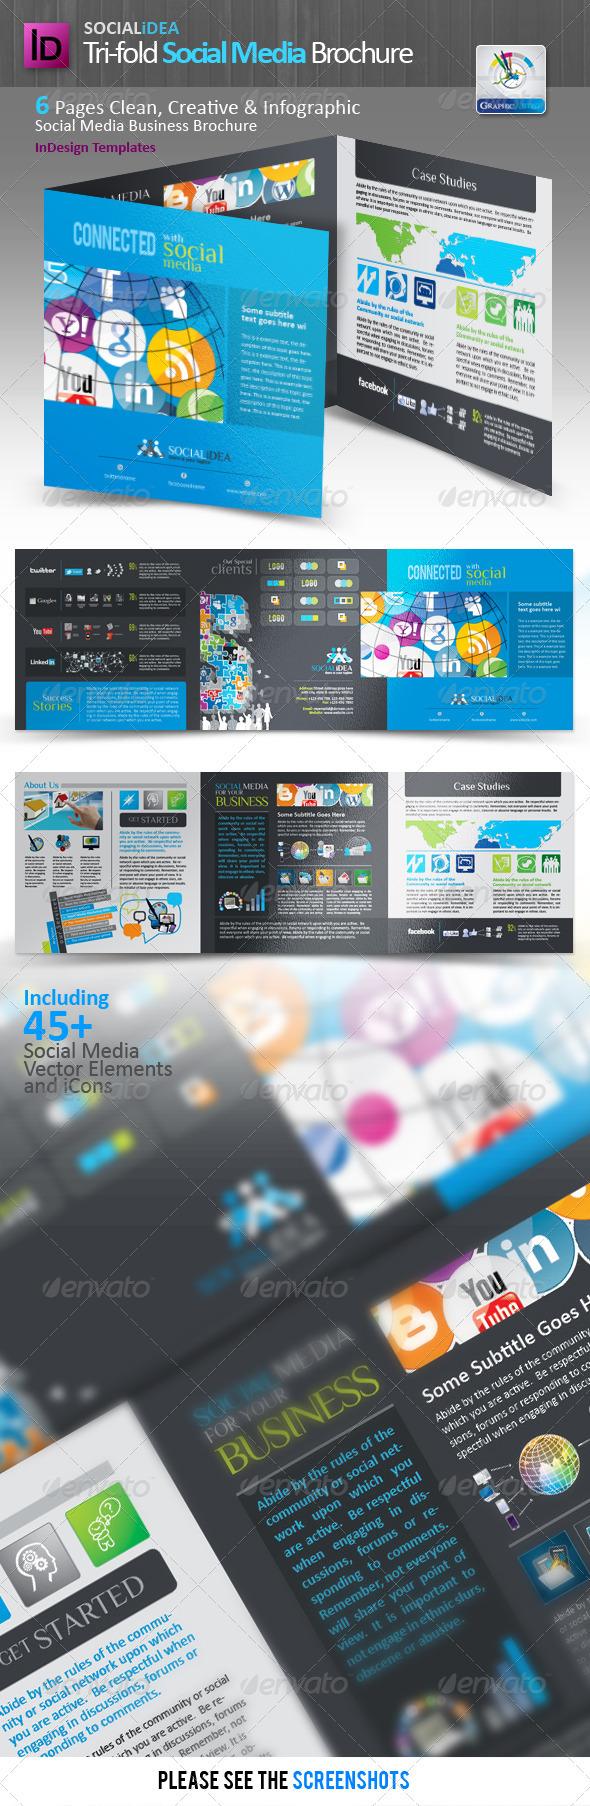 GraphicRiver Socialidea Tri-fold Social Media Brochure 3528384